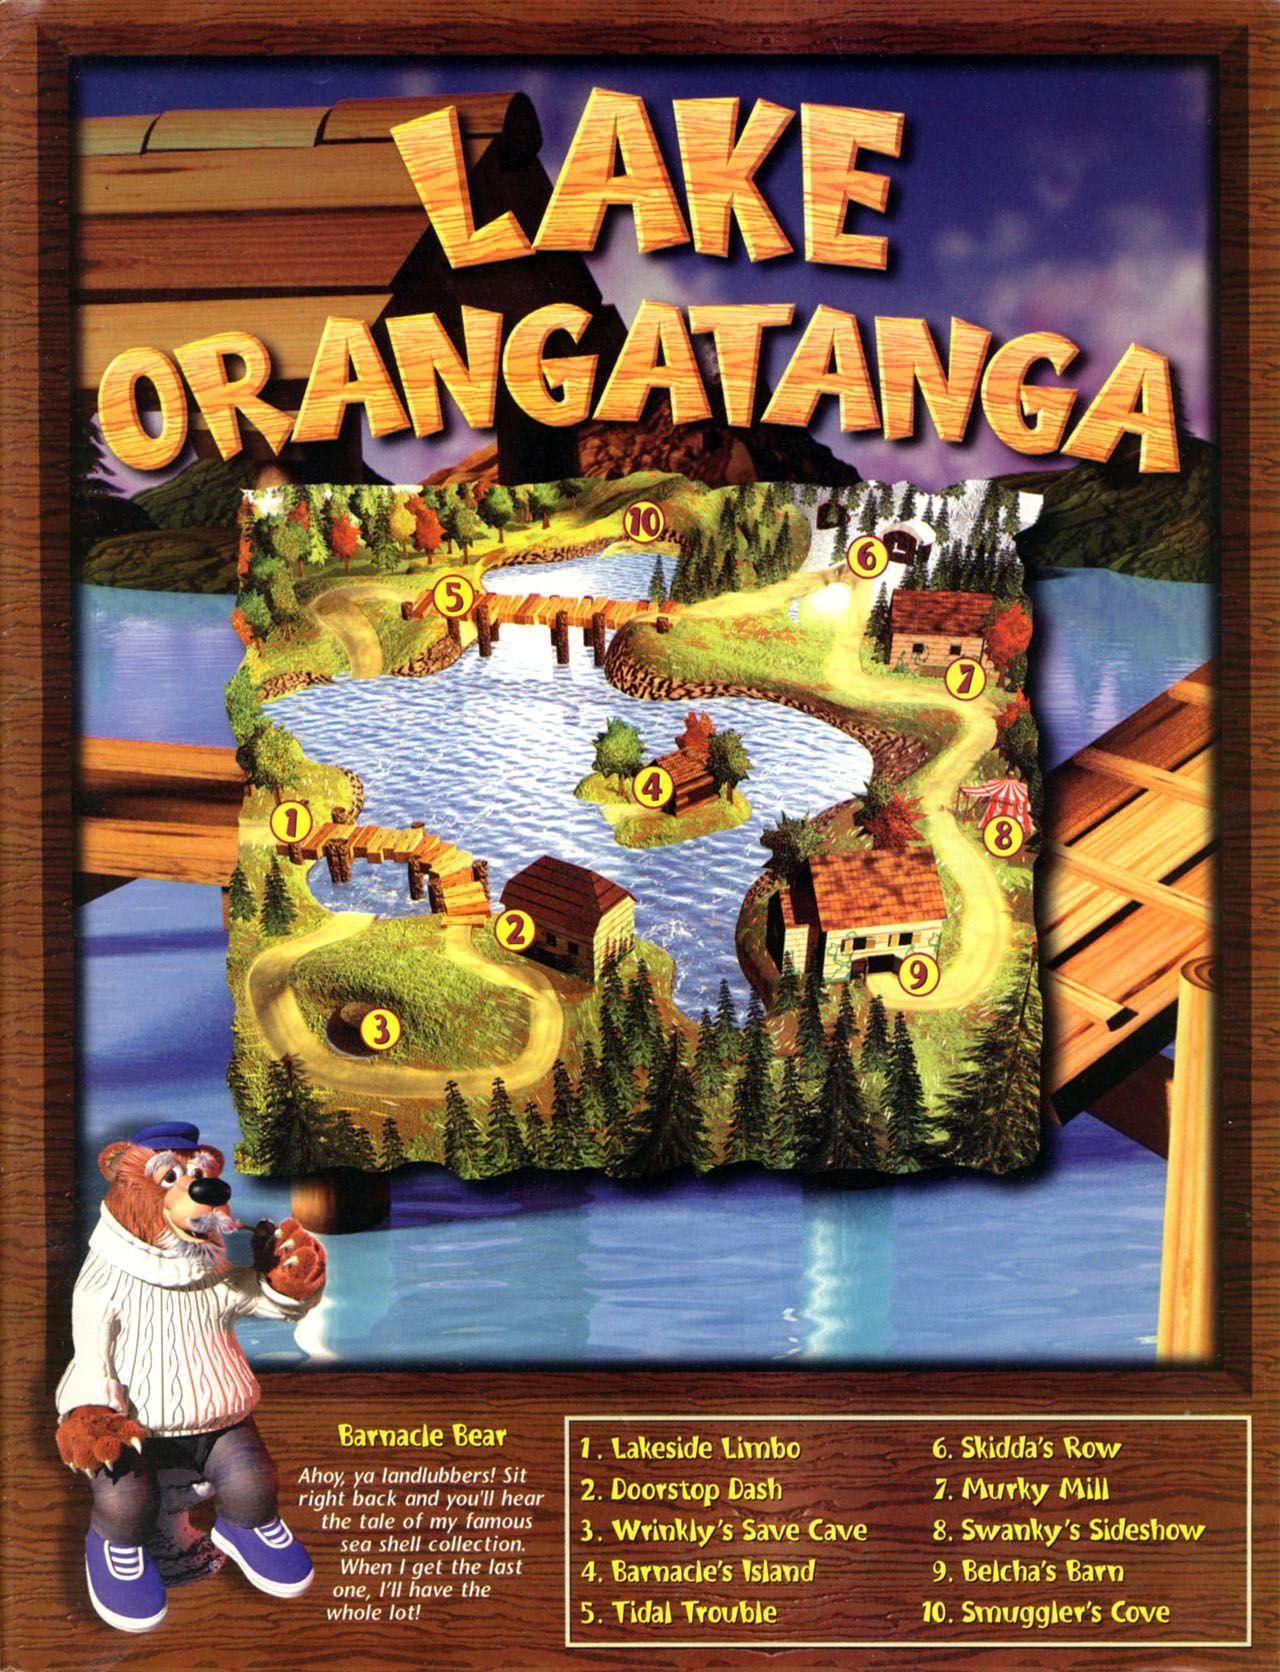 Lake Orangatanga Donkey kong, Comic book cover, Sideshow